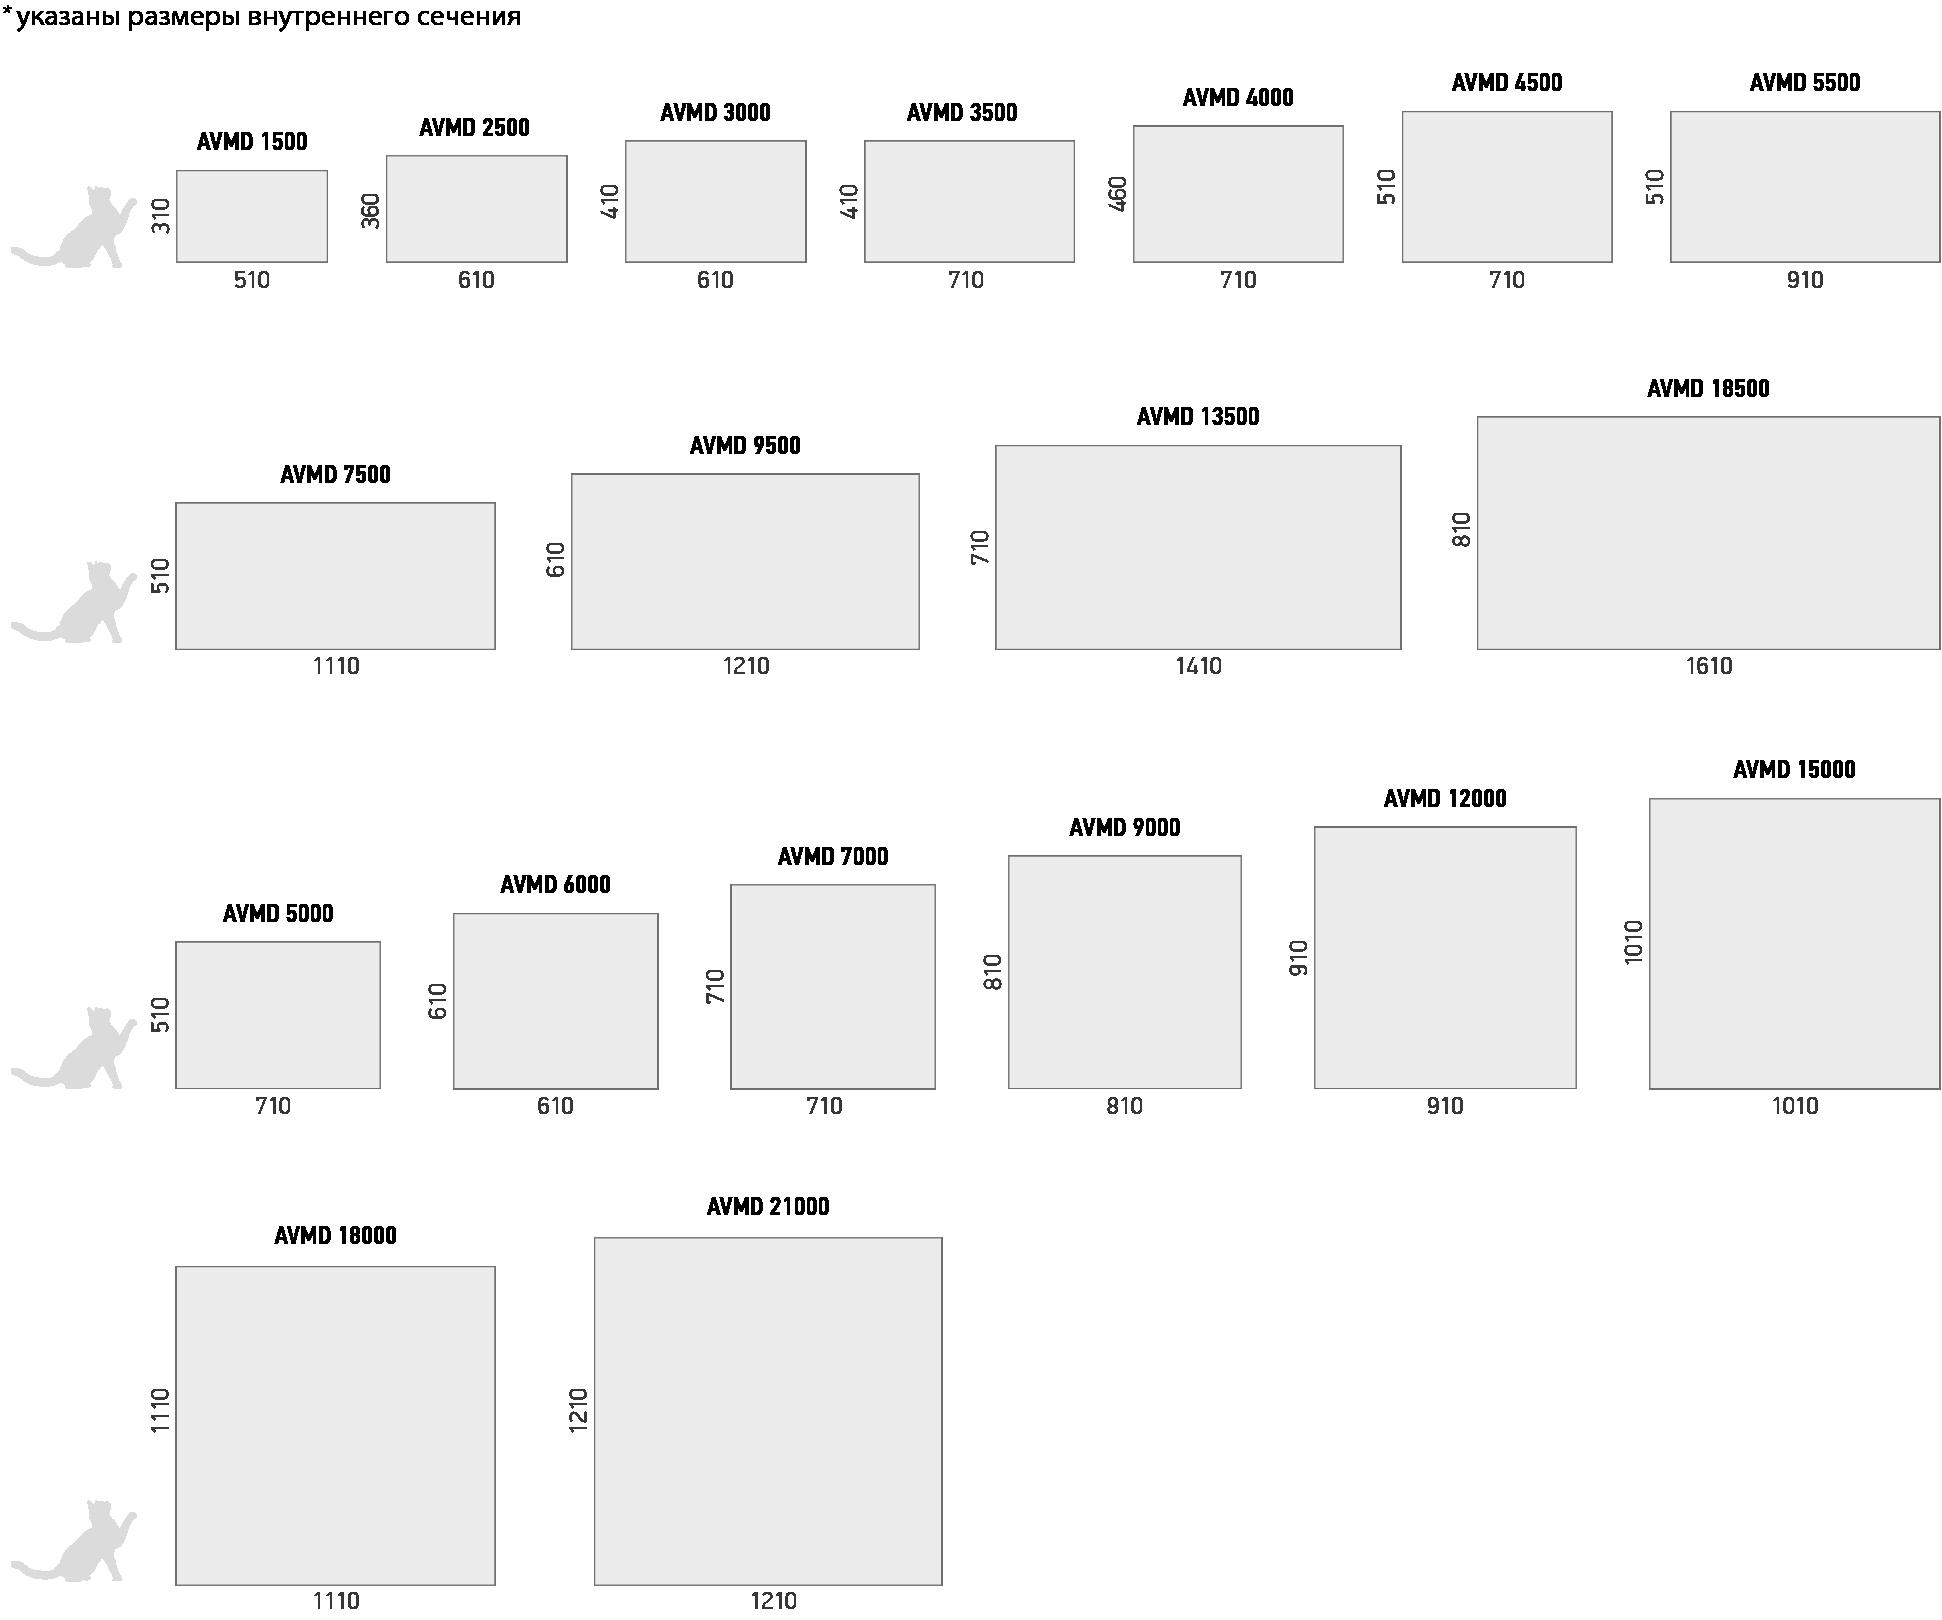 Типоразмеры центральных кондиционеров AVM, AVMD